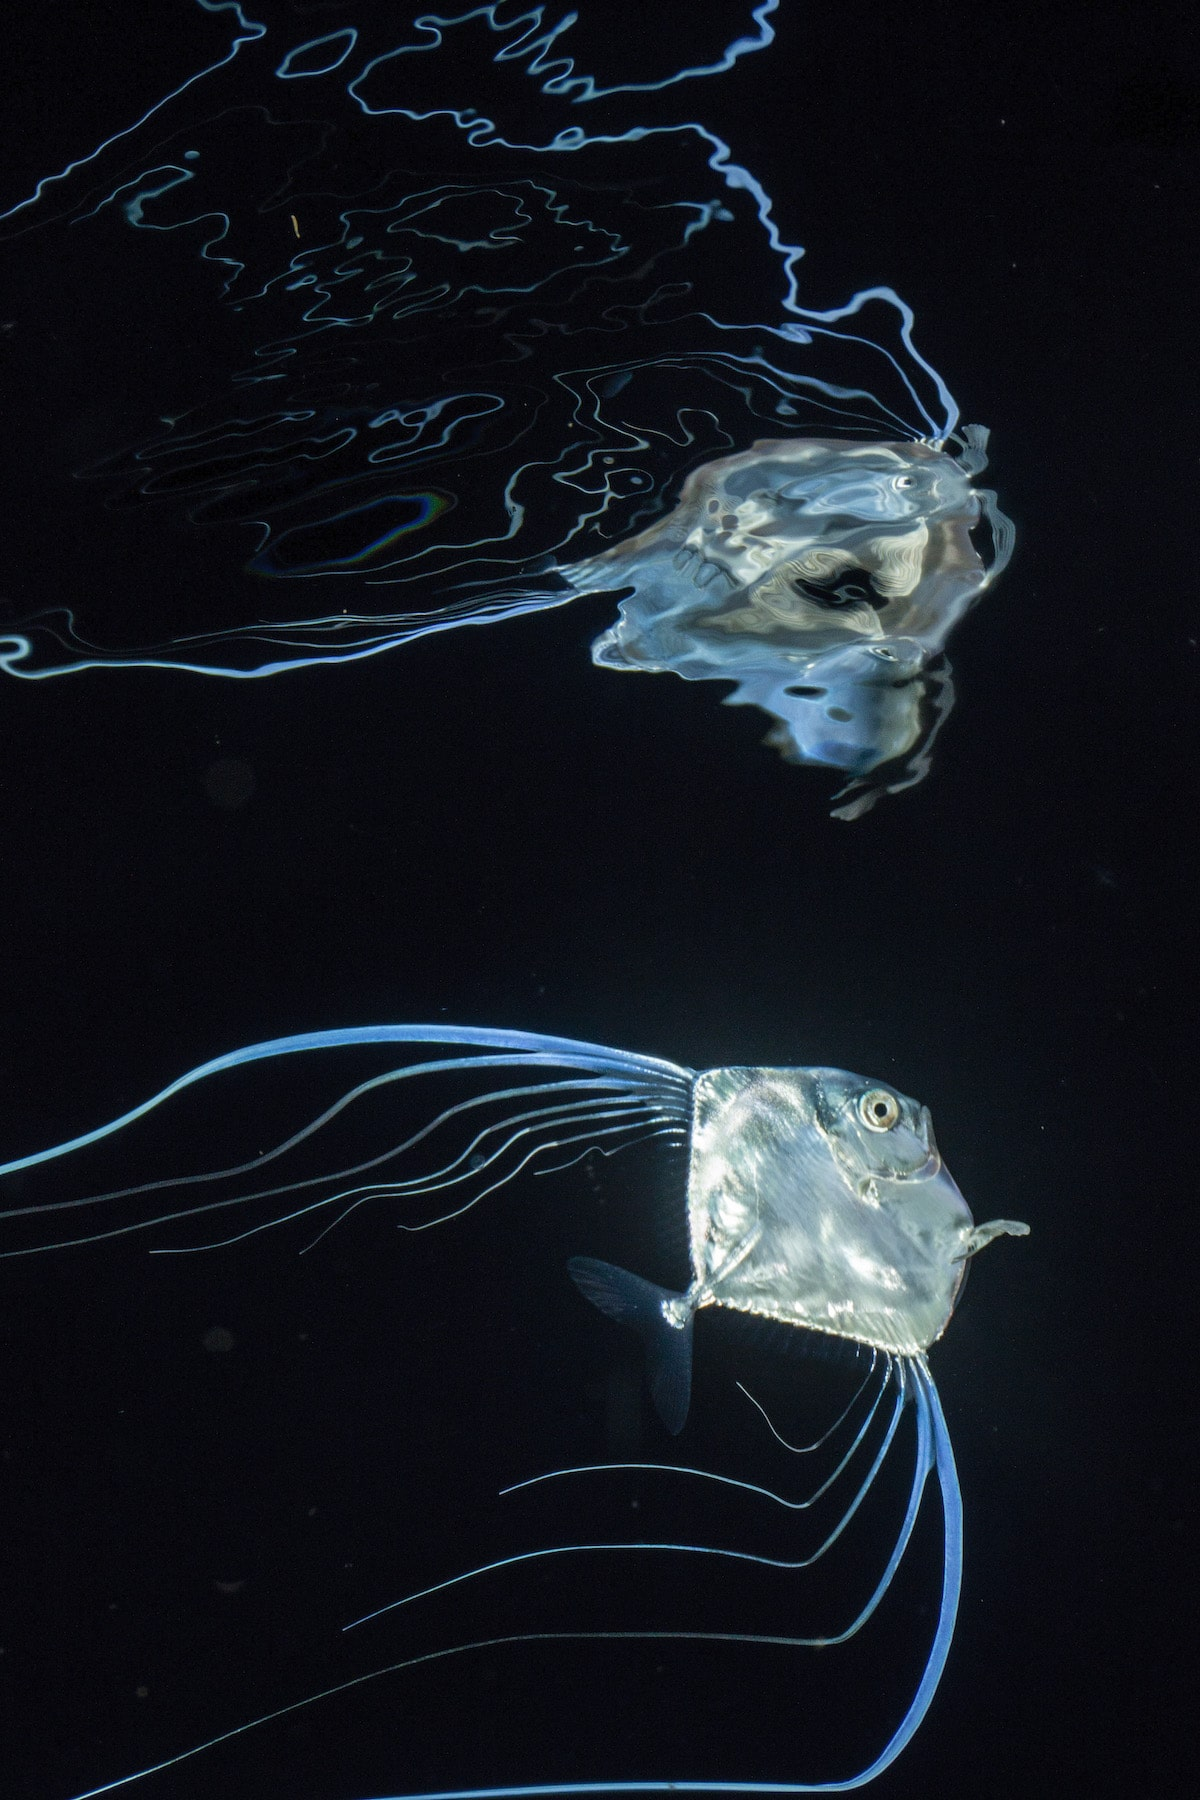 Alectis ciliaris blackwater photo by Jeff Milisen